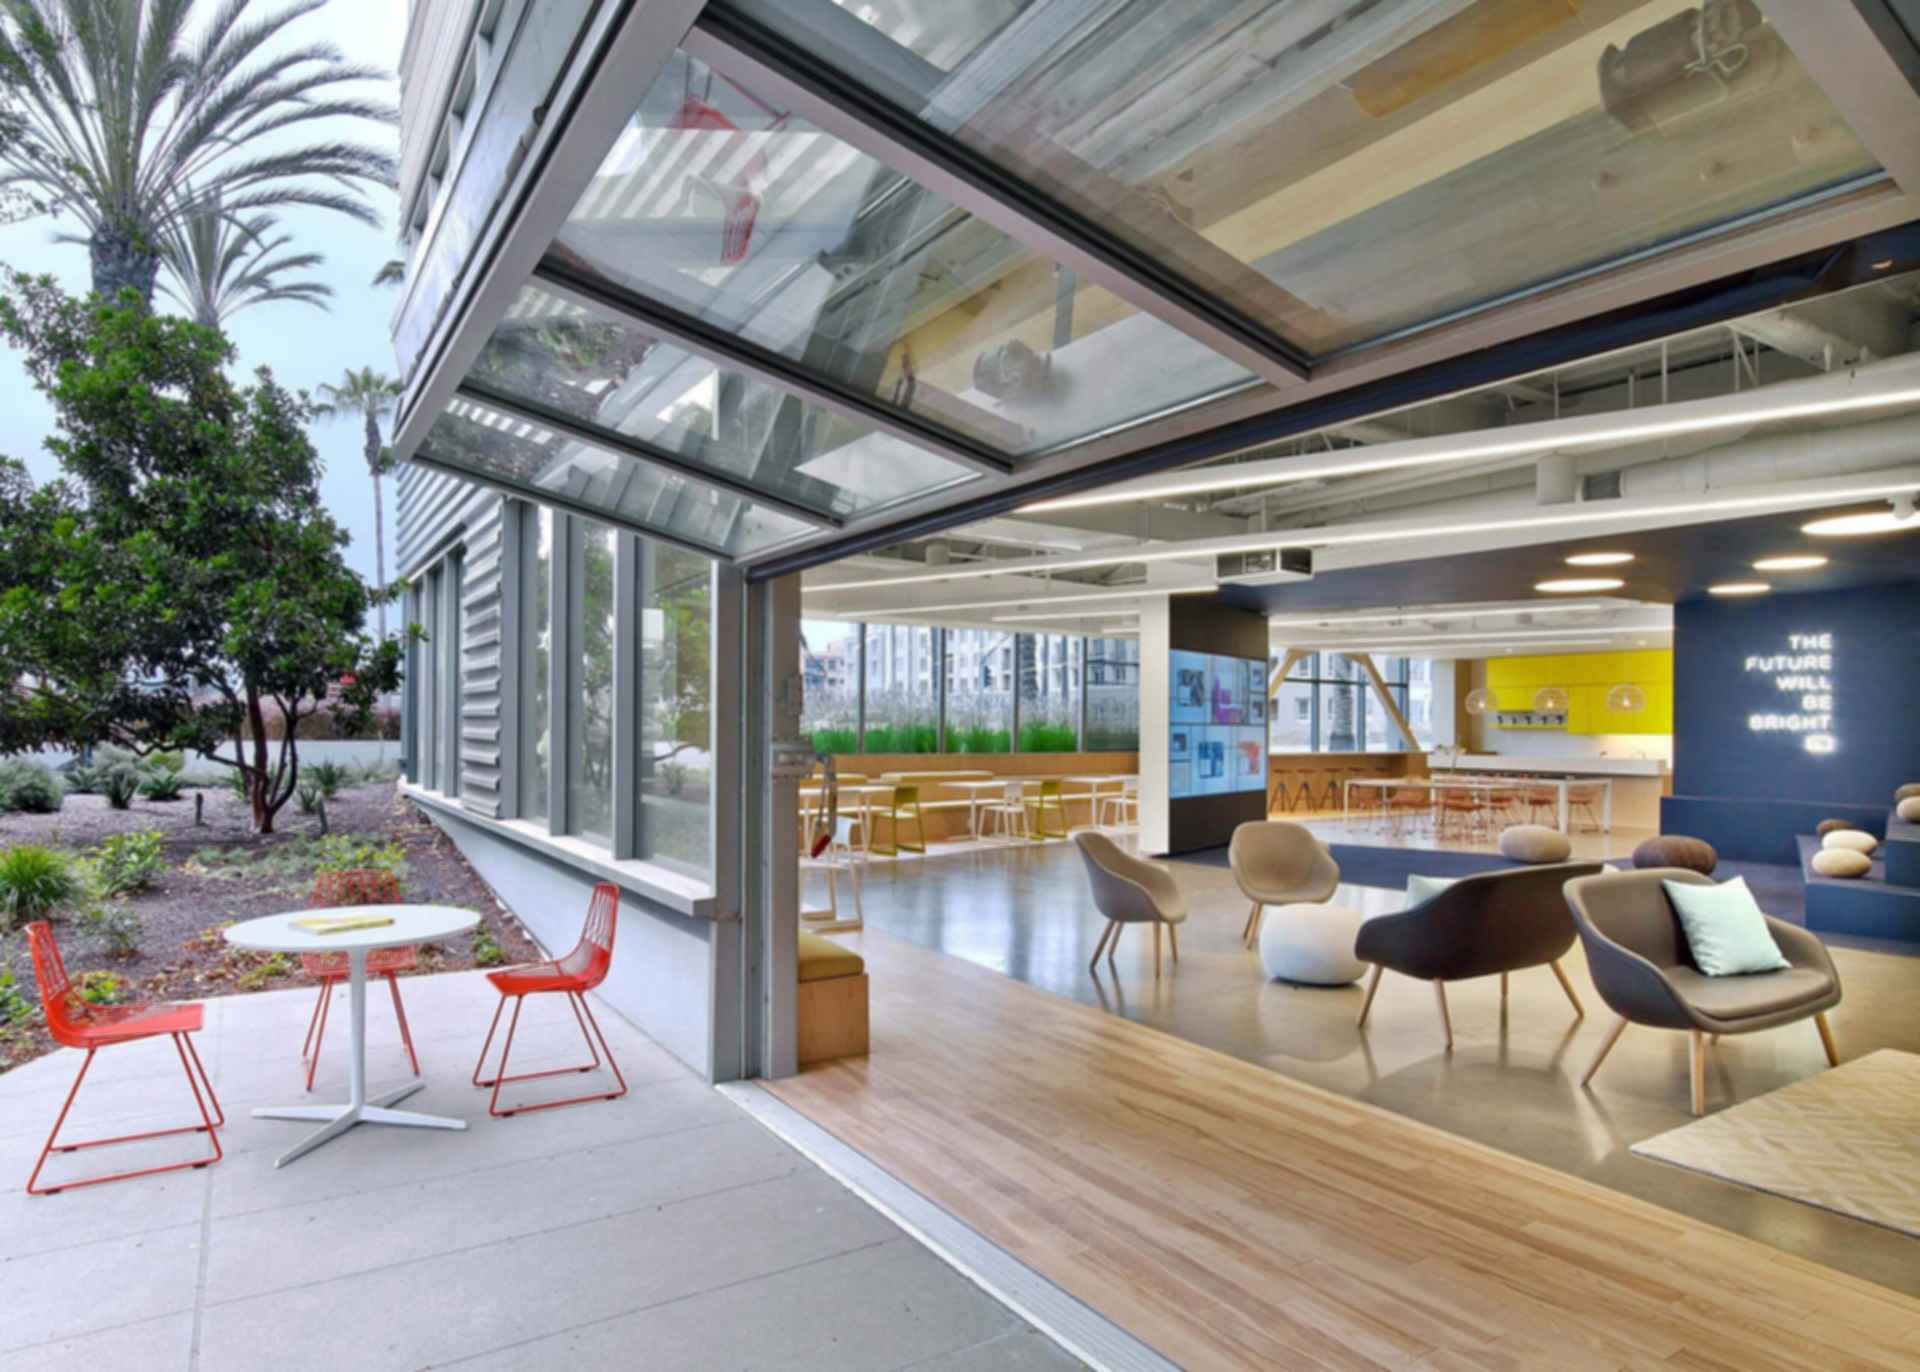 Fullscreen Offices - Outdoor Area